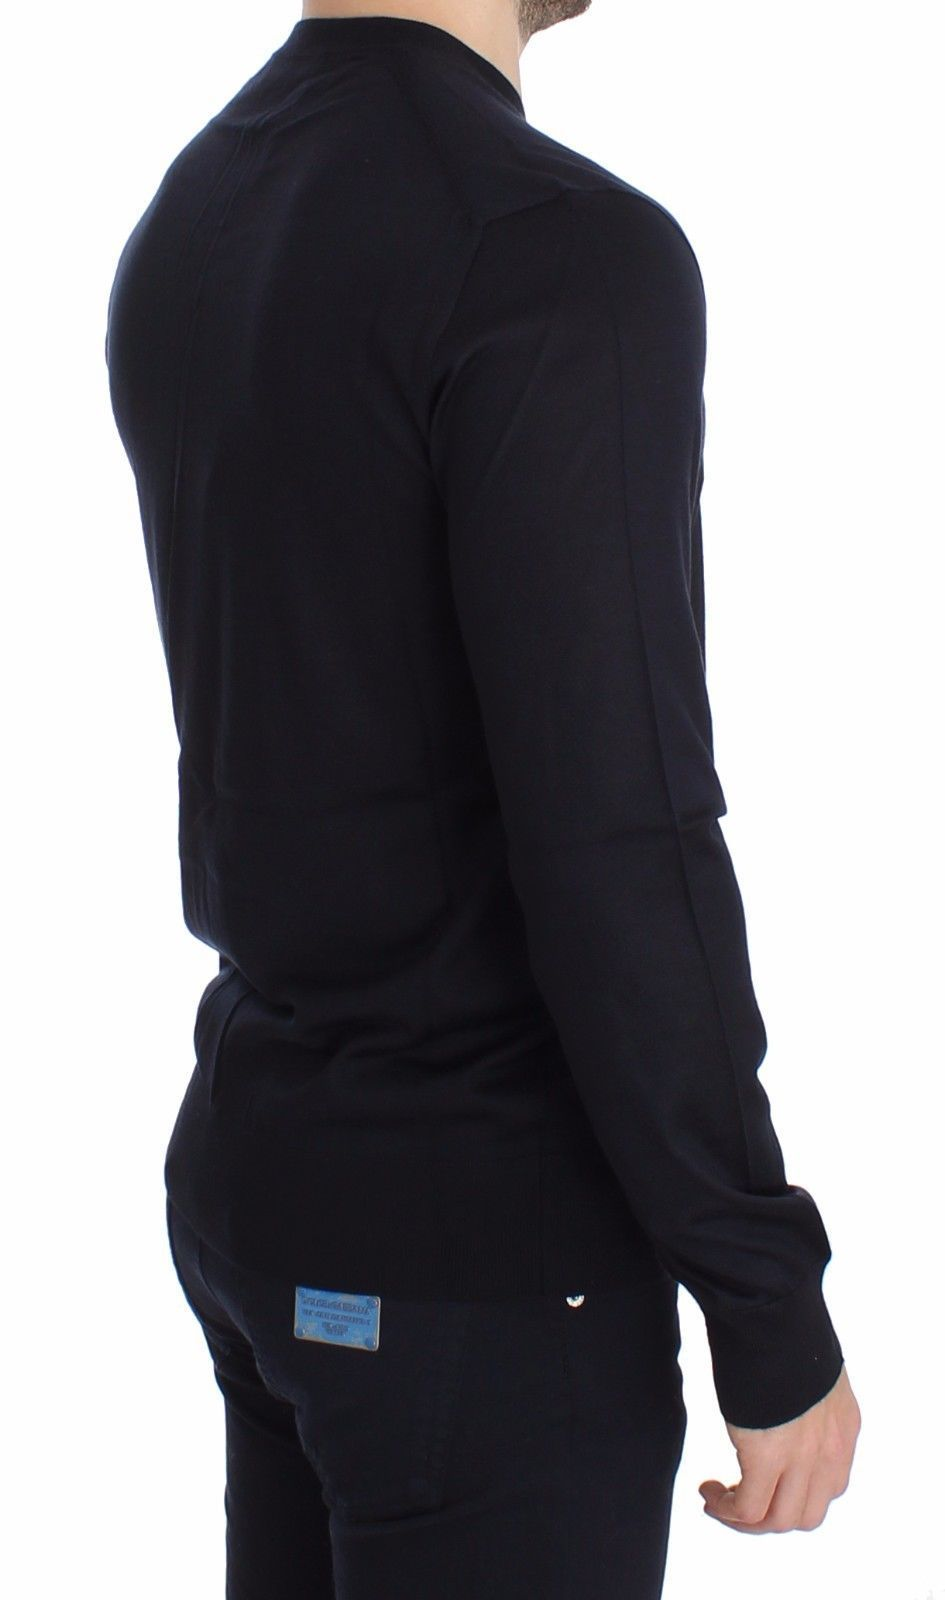 Dolce & Gabbana Blue Silk Cashmere V-neck Sweater Pullover 14034